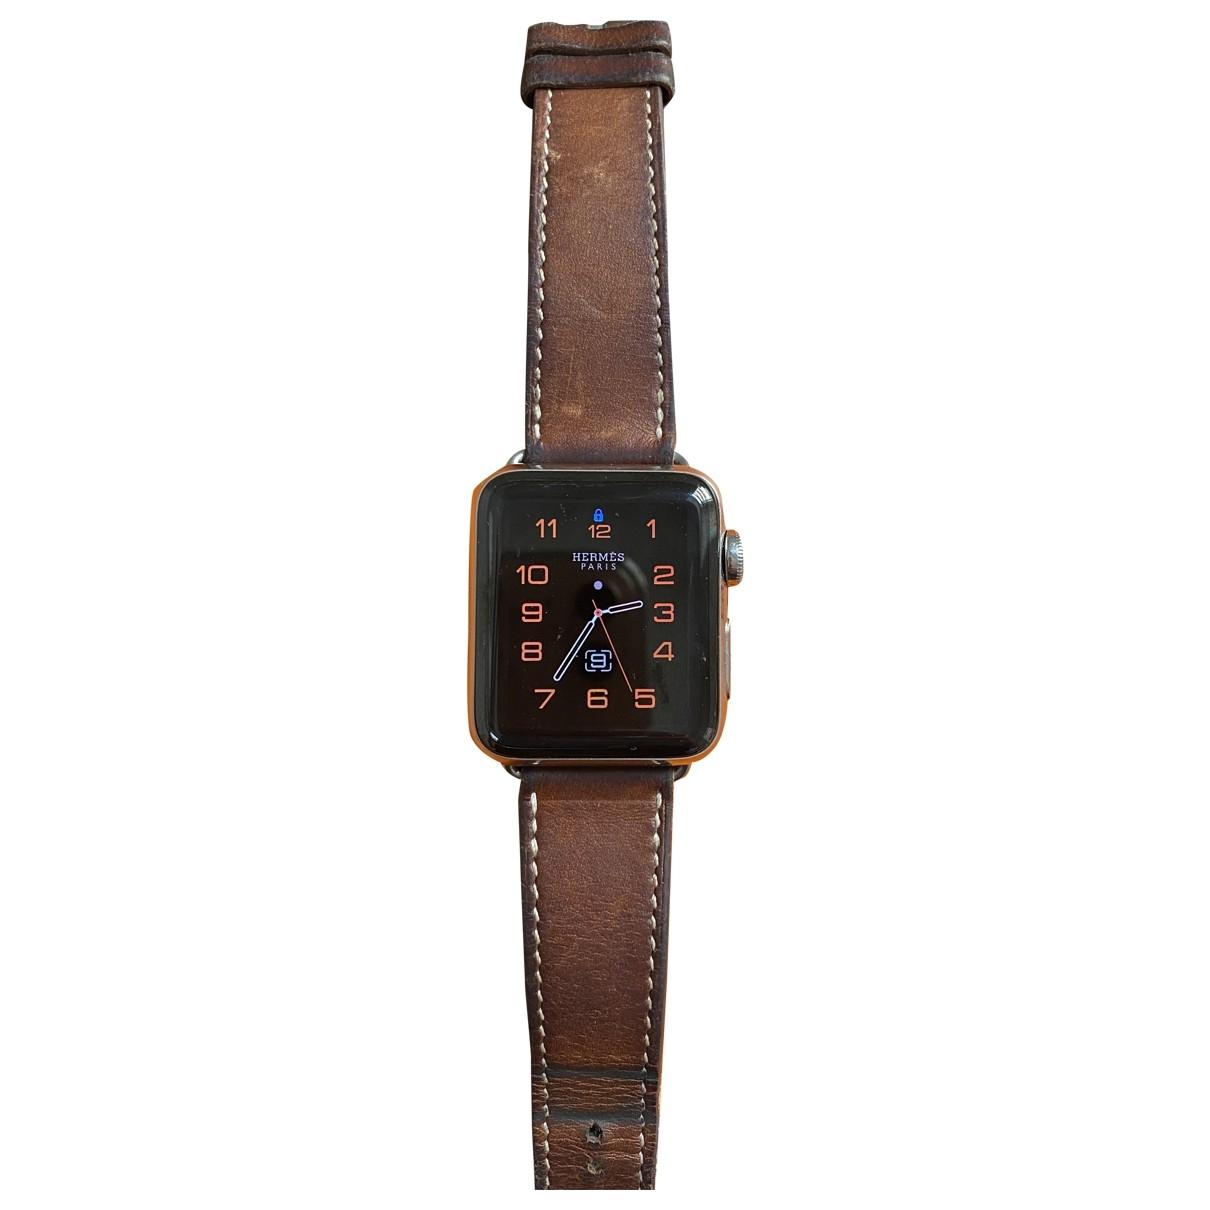 Apple Apple Watch x Hermes 38mm Uhr in  Silber Stahl